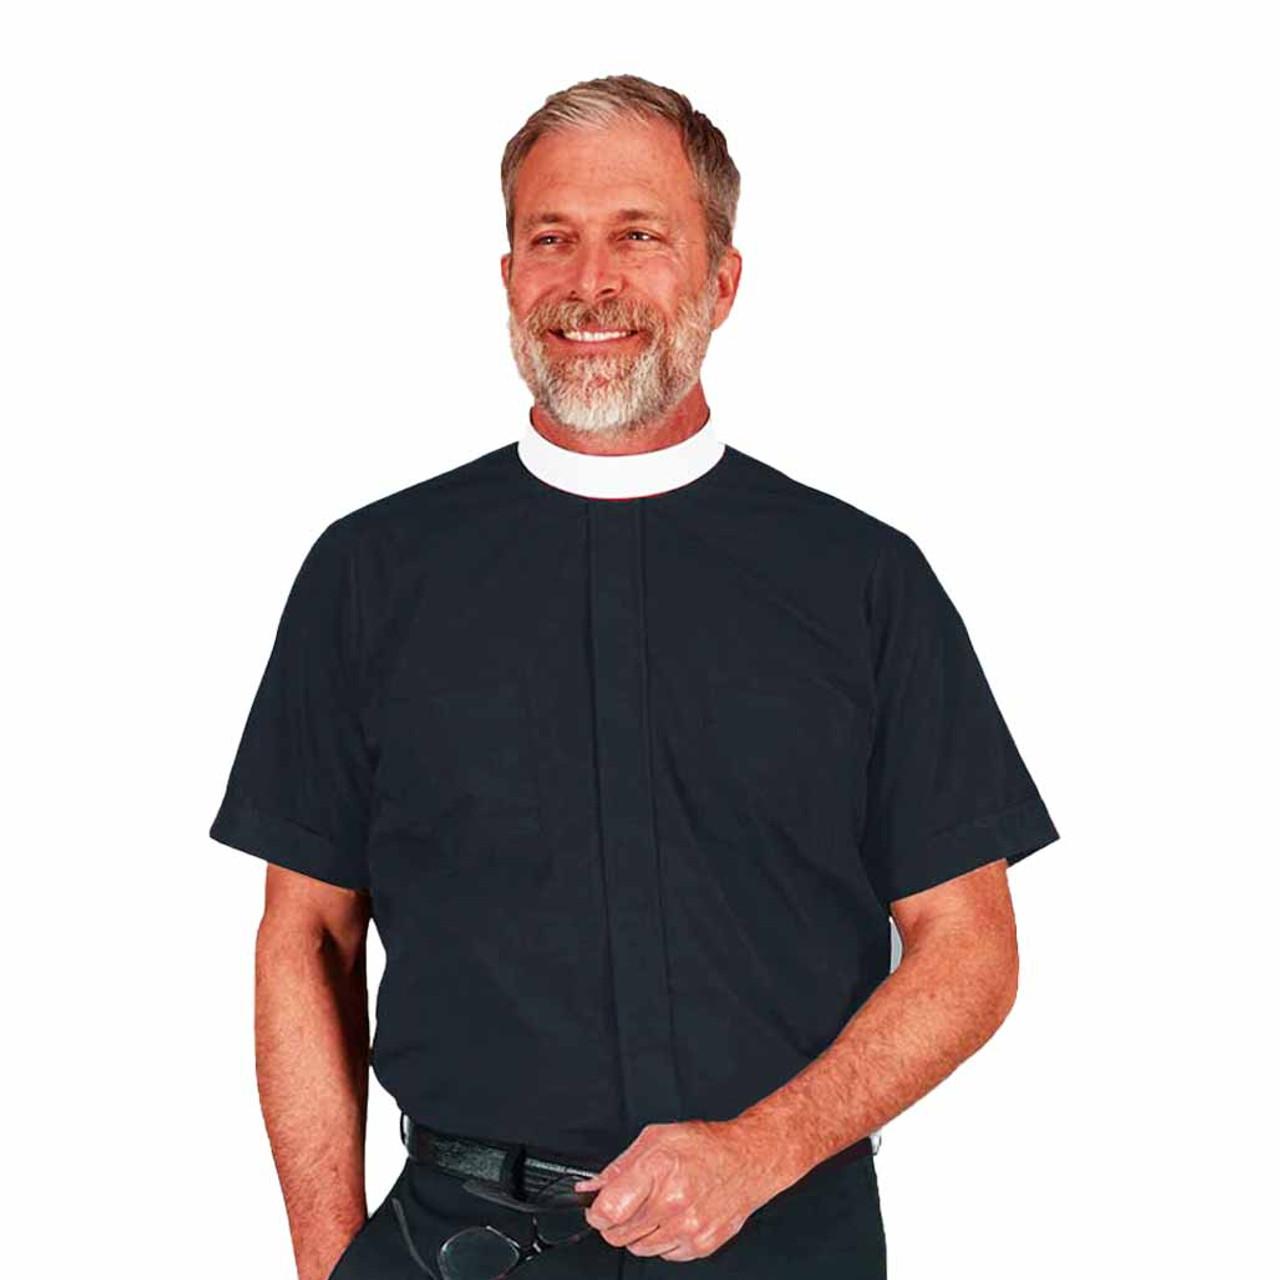 202 SS Black Neckband Shirt